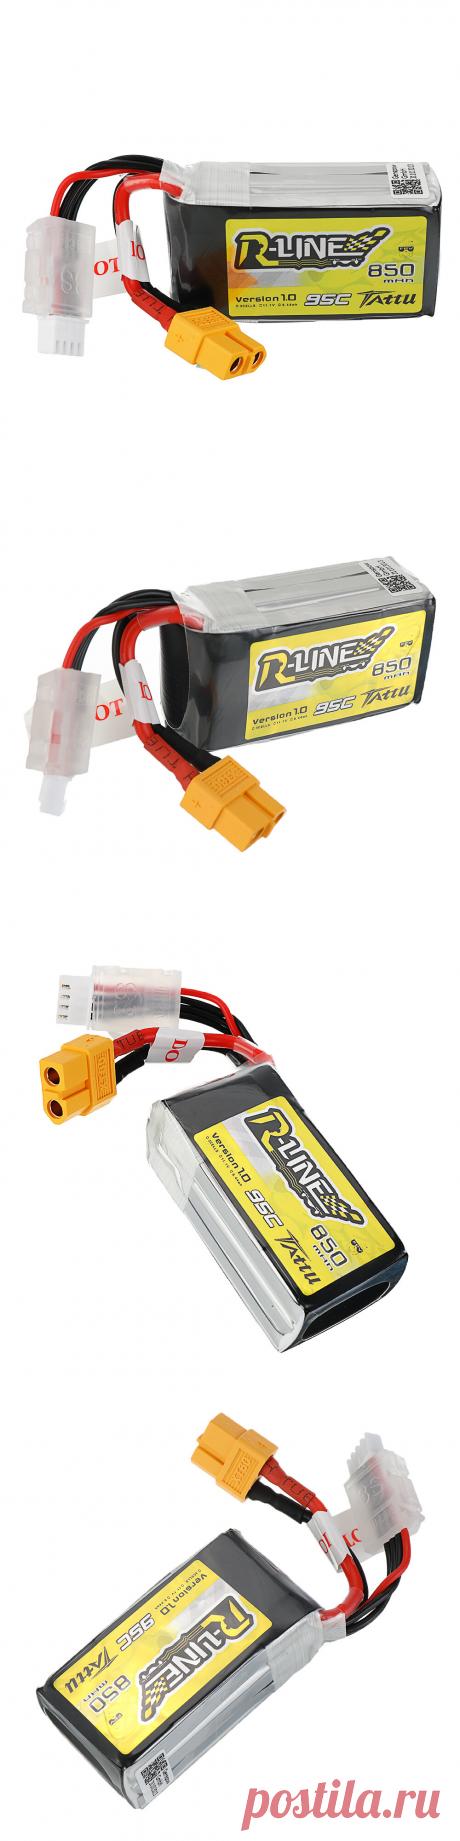 tattu r-line 1.0 11.1v 850mah 95c 3s lipo battery xt30 plug for for 100mm to 180mm multirotor fpv Sale - Banggood.com